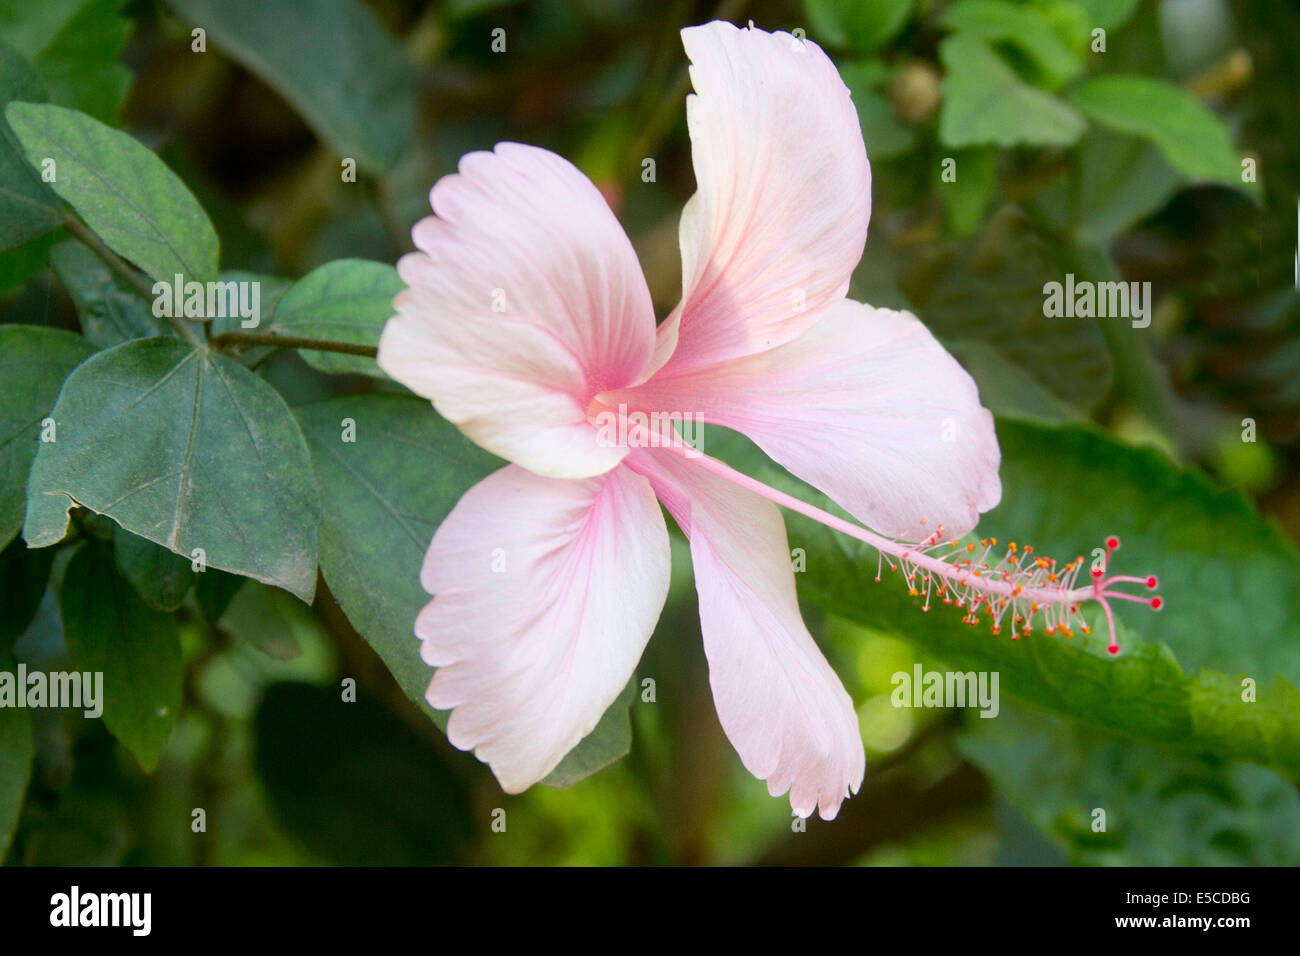 India Hibiscus Flower Stock Photos India Hibiscus Flower Stock